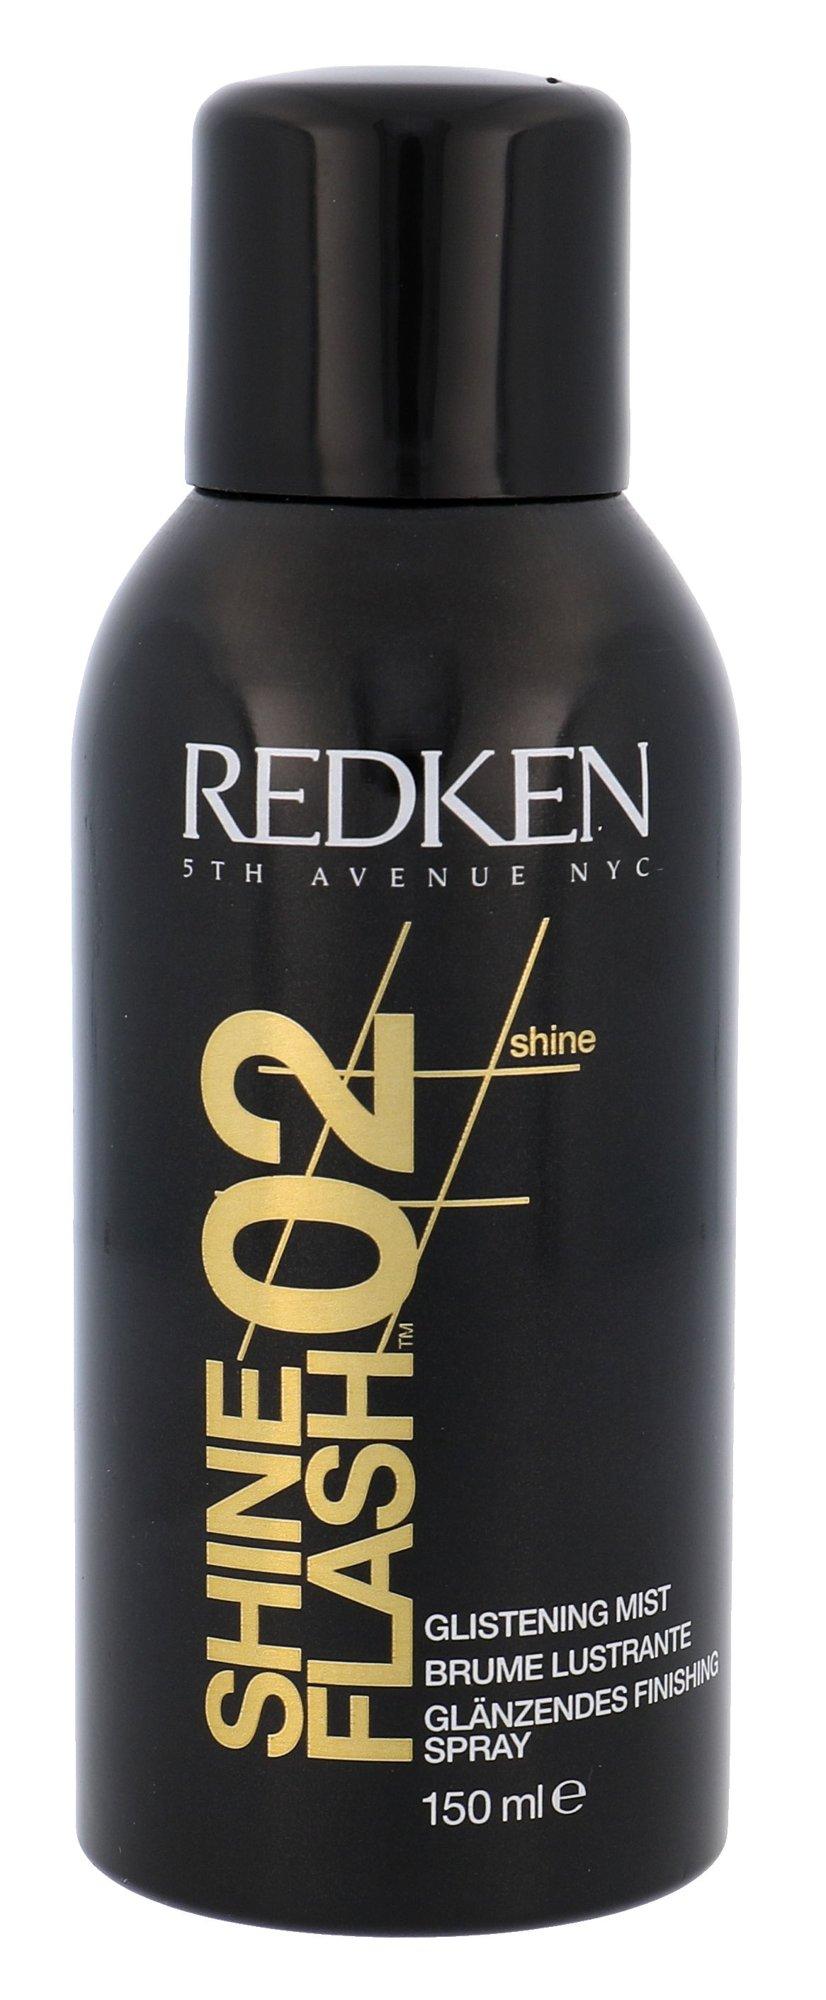 Redken Shine Flash 02 Cosmetic 150ml